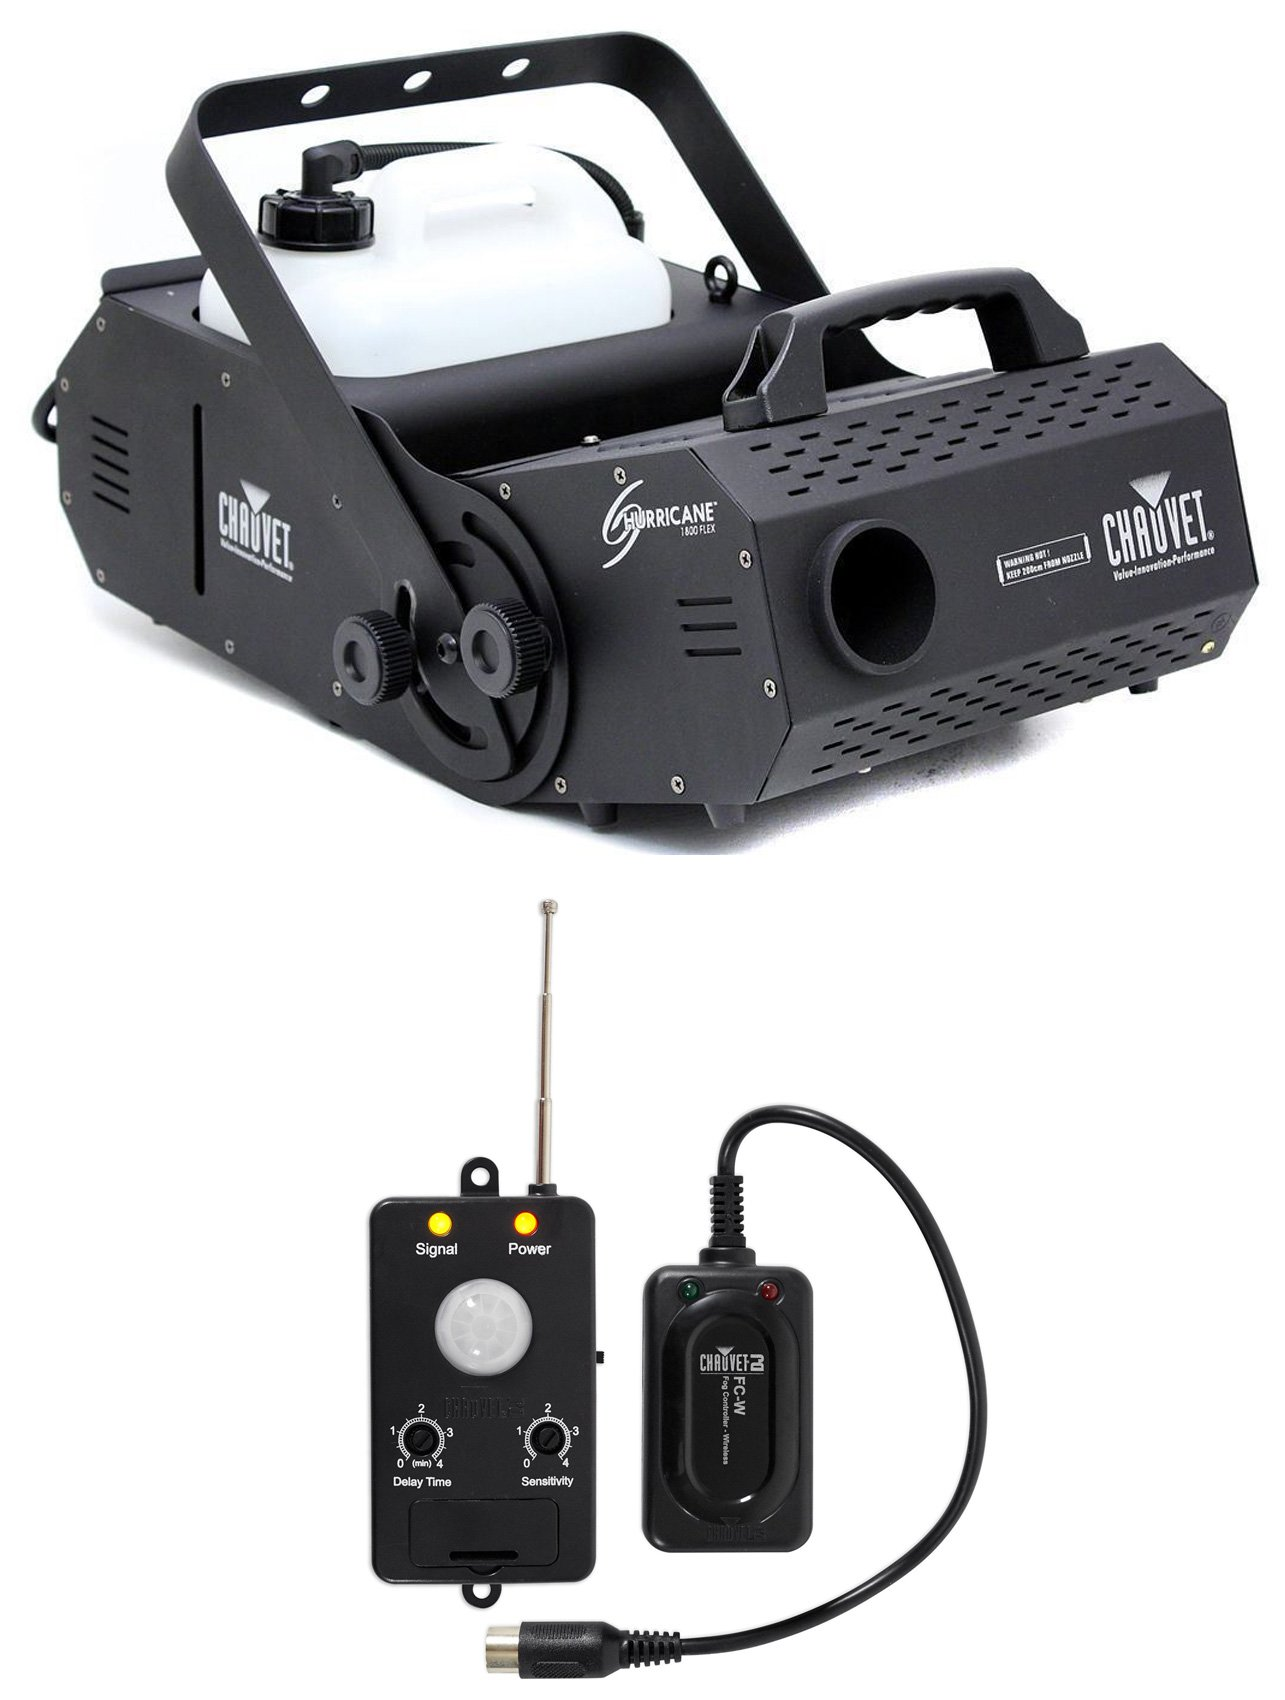 Chauvet HURRICANE H-1800 FLEX Fog Smoke Machine H1800+Transmitter Motion Sensor